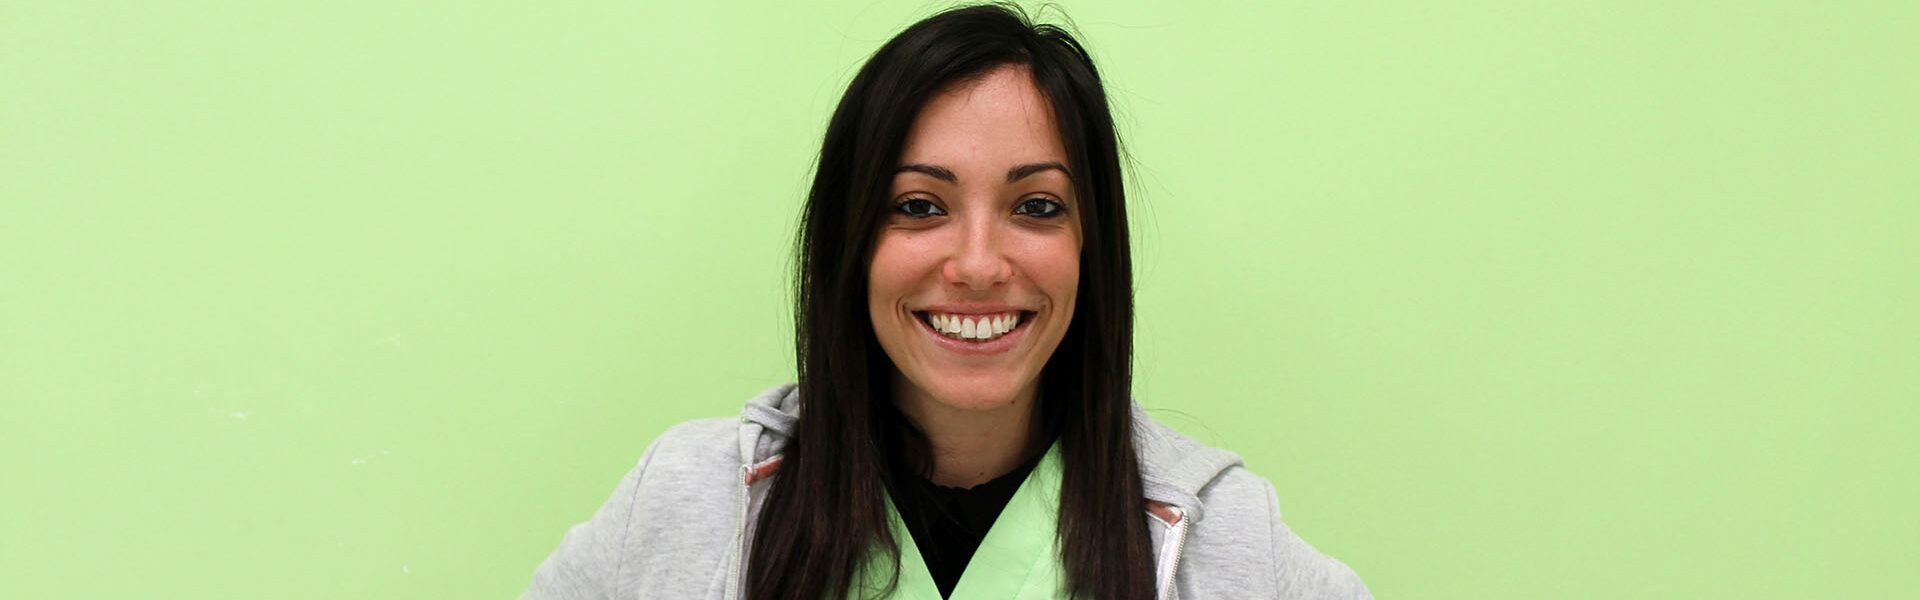 Claudia Palmieri, Logopedista